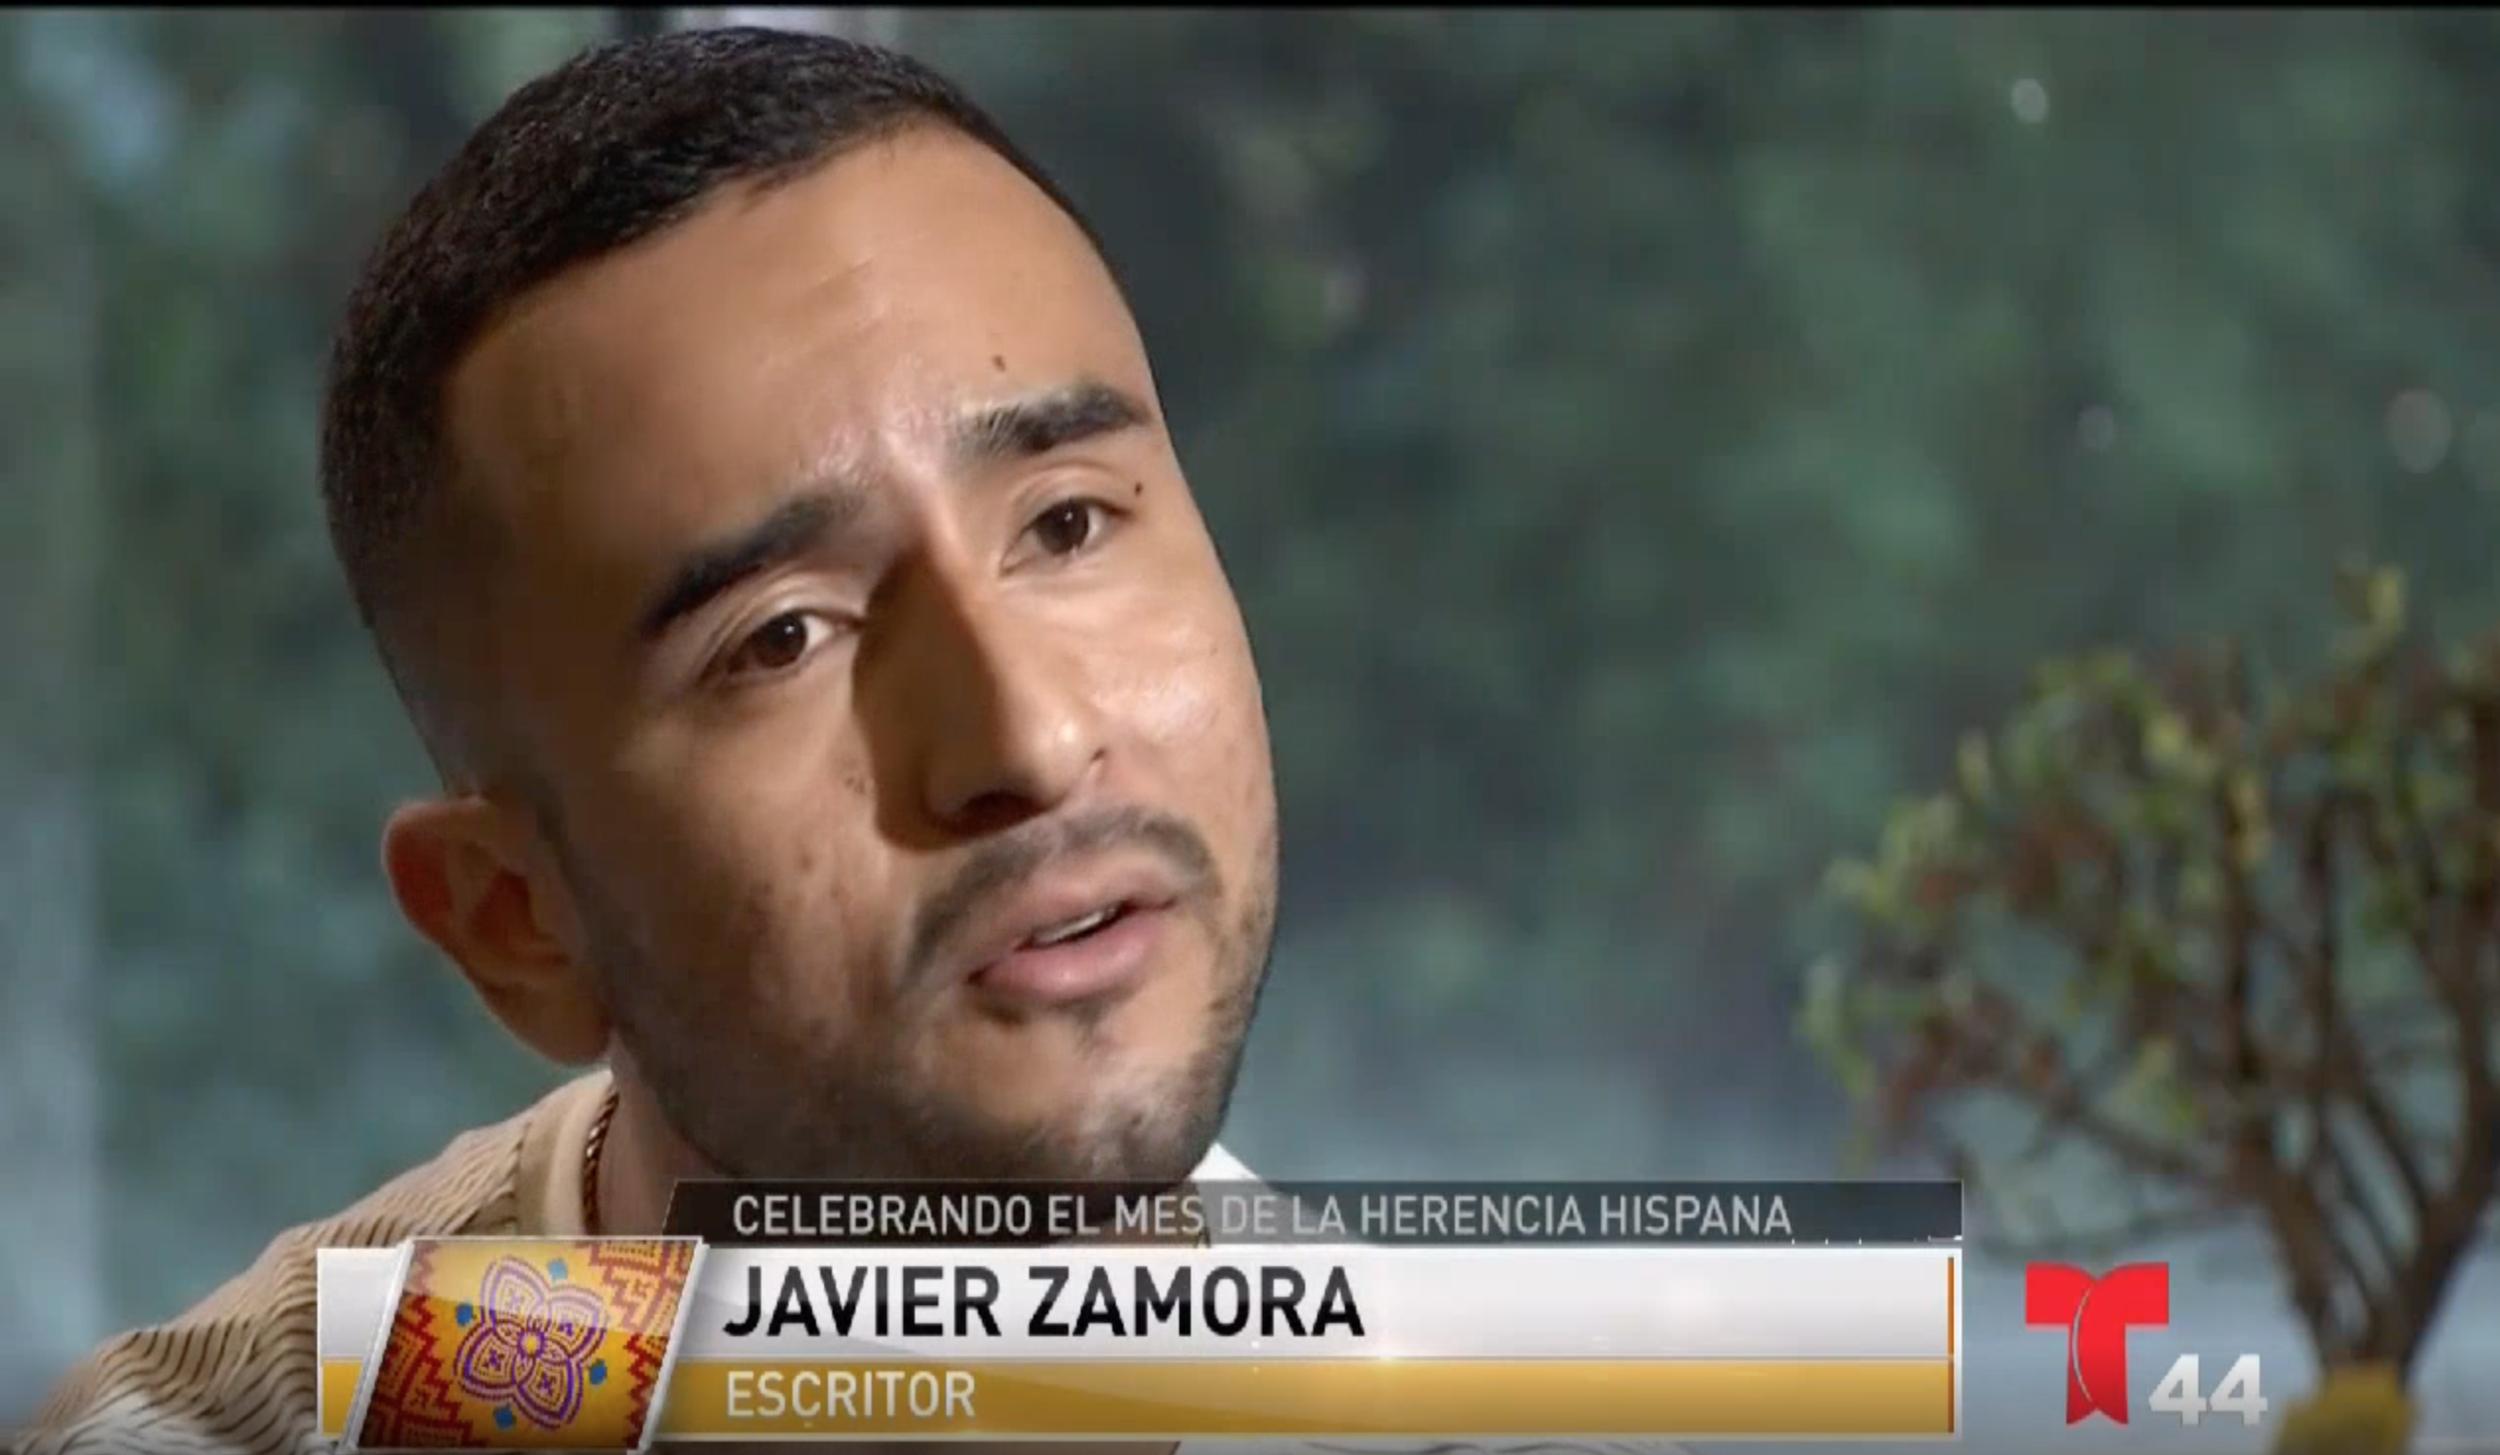 JavierZamoraTelemundo.png